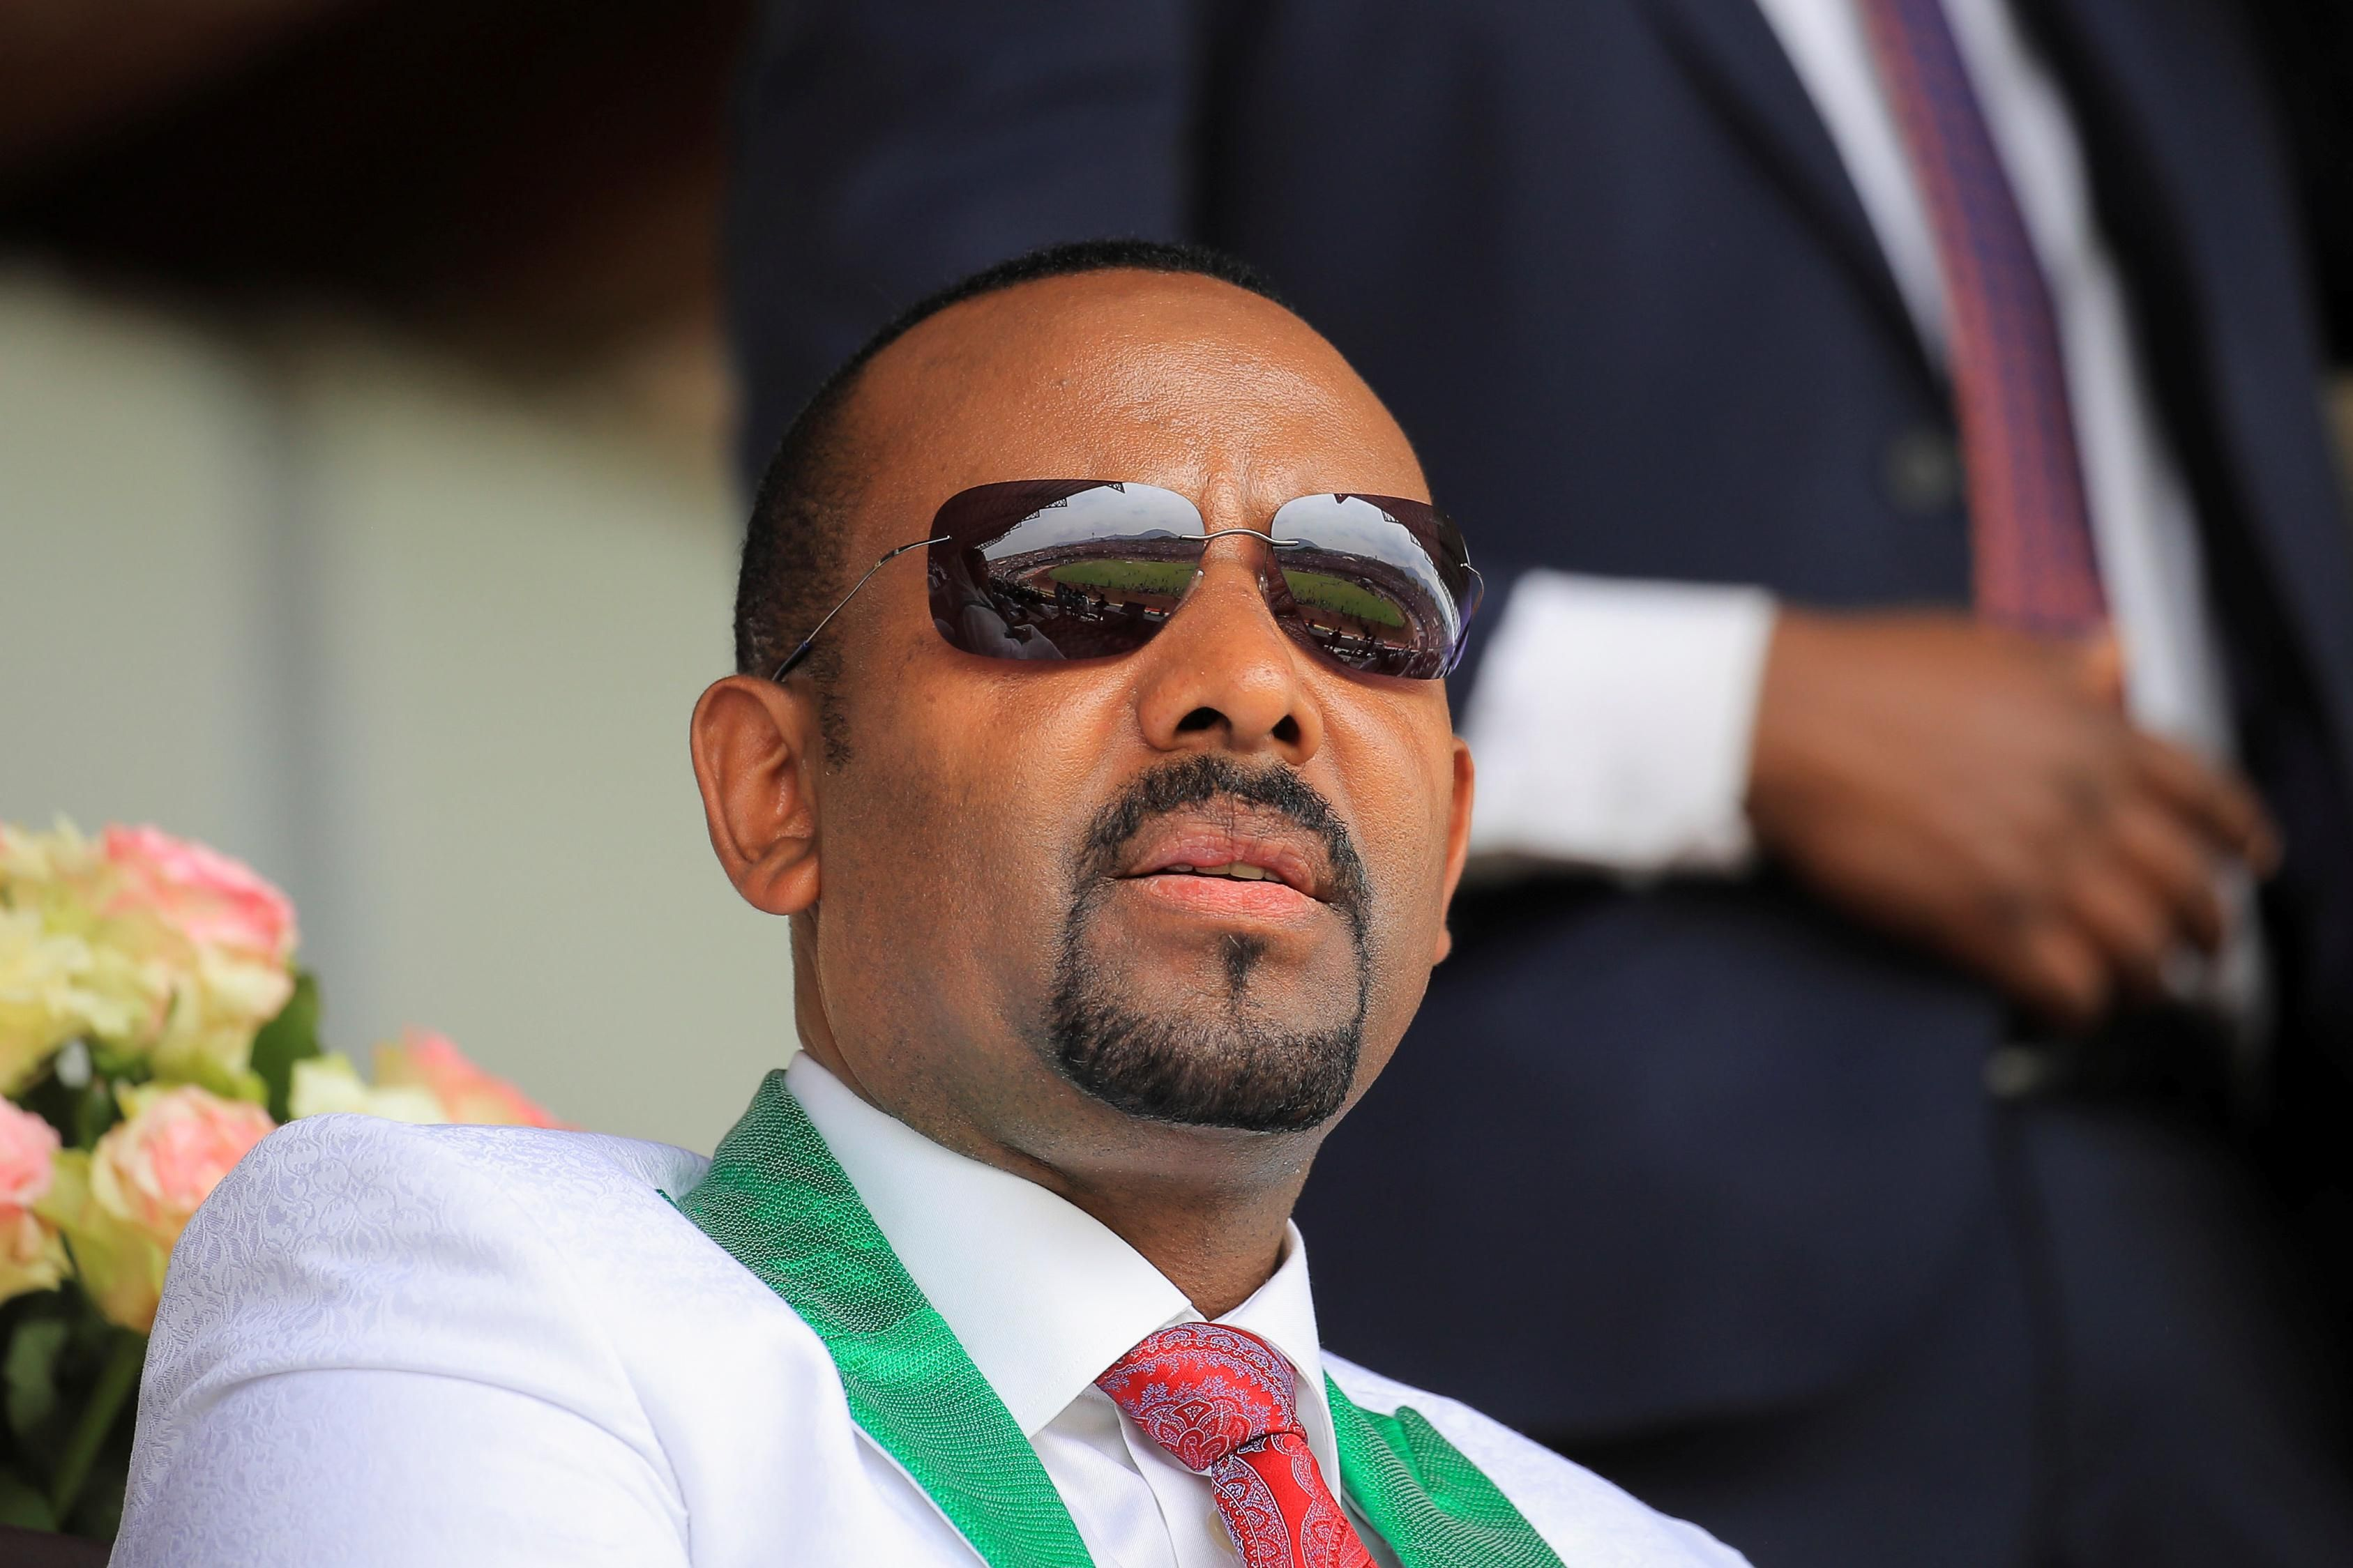 Ethiopia's PM wanted legitimacy – did he get it?